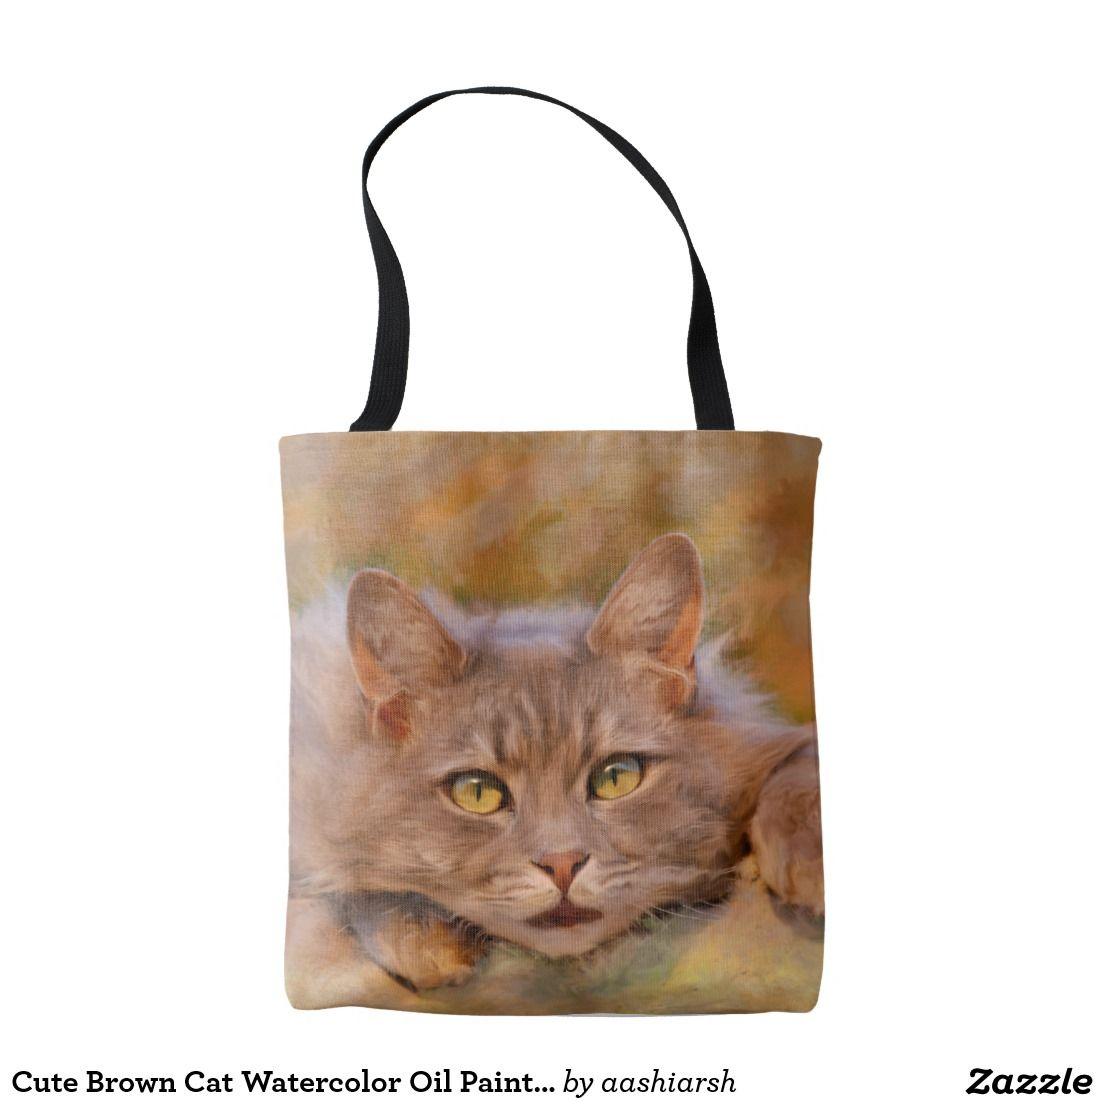 Cute Brown Cat Watercolor Oil Painting Art Tote Bag Kitten Kitty Pet Flowers Tote Tote Bag Colorful Tote Bags